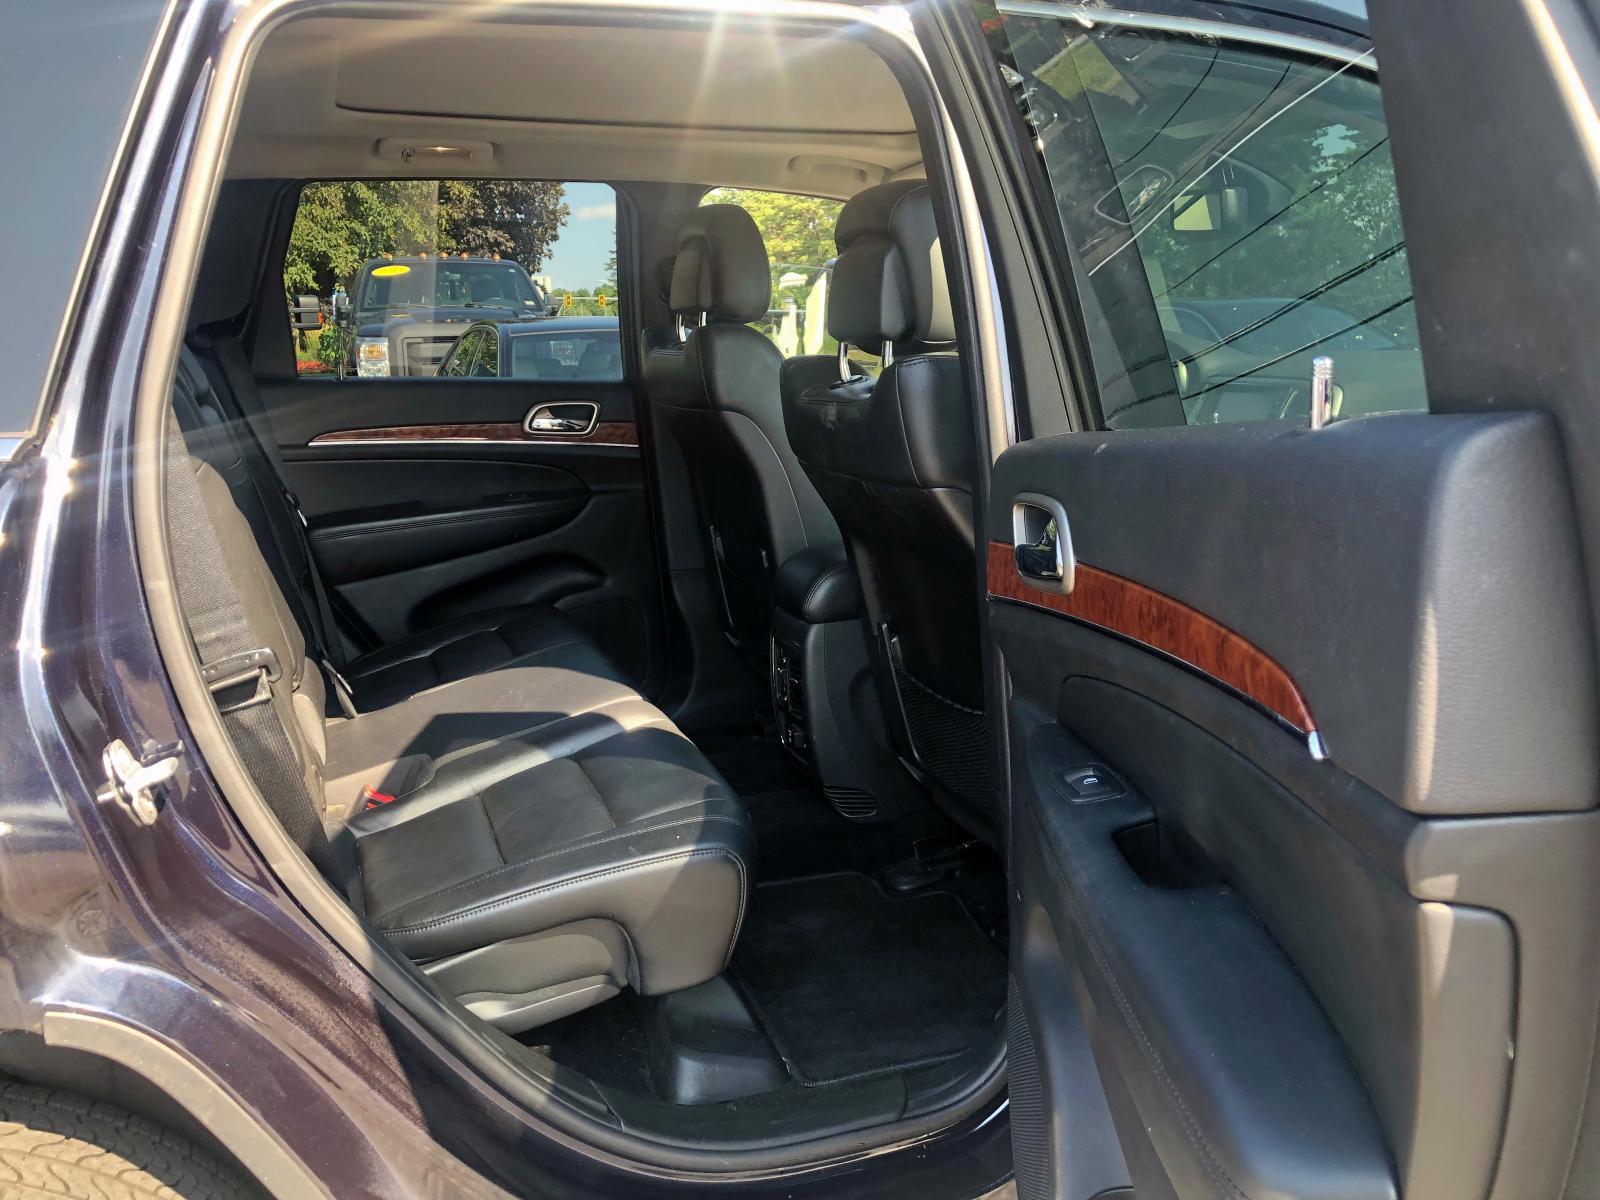 1J4RR5GG0BC656093 - 2011 Jeep Grand Cher 3.6L detail view